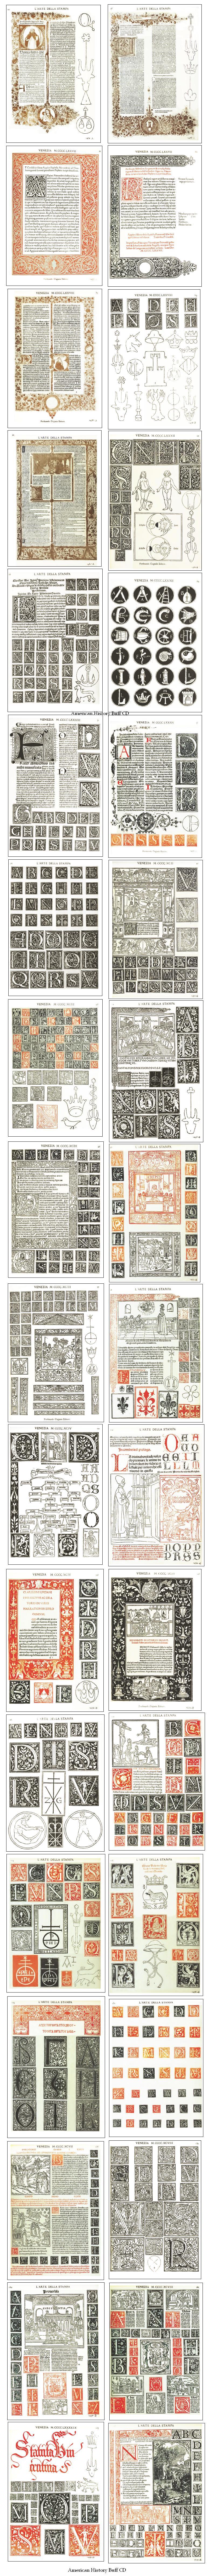 venetian typography italian renaissance woodcut printing italian renaissance